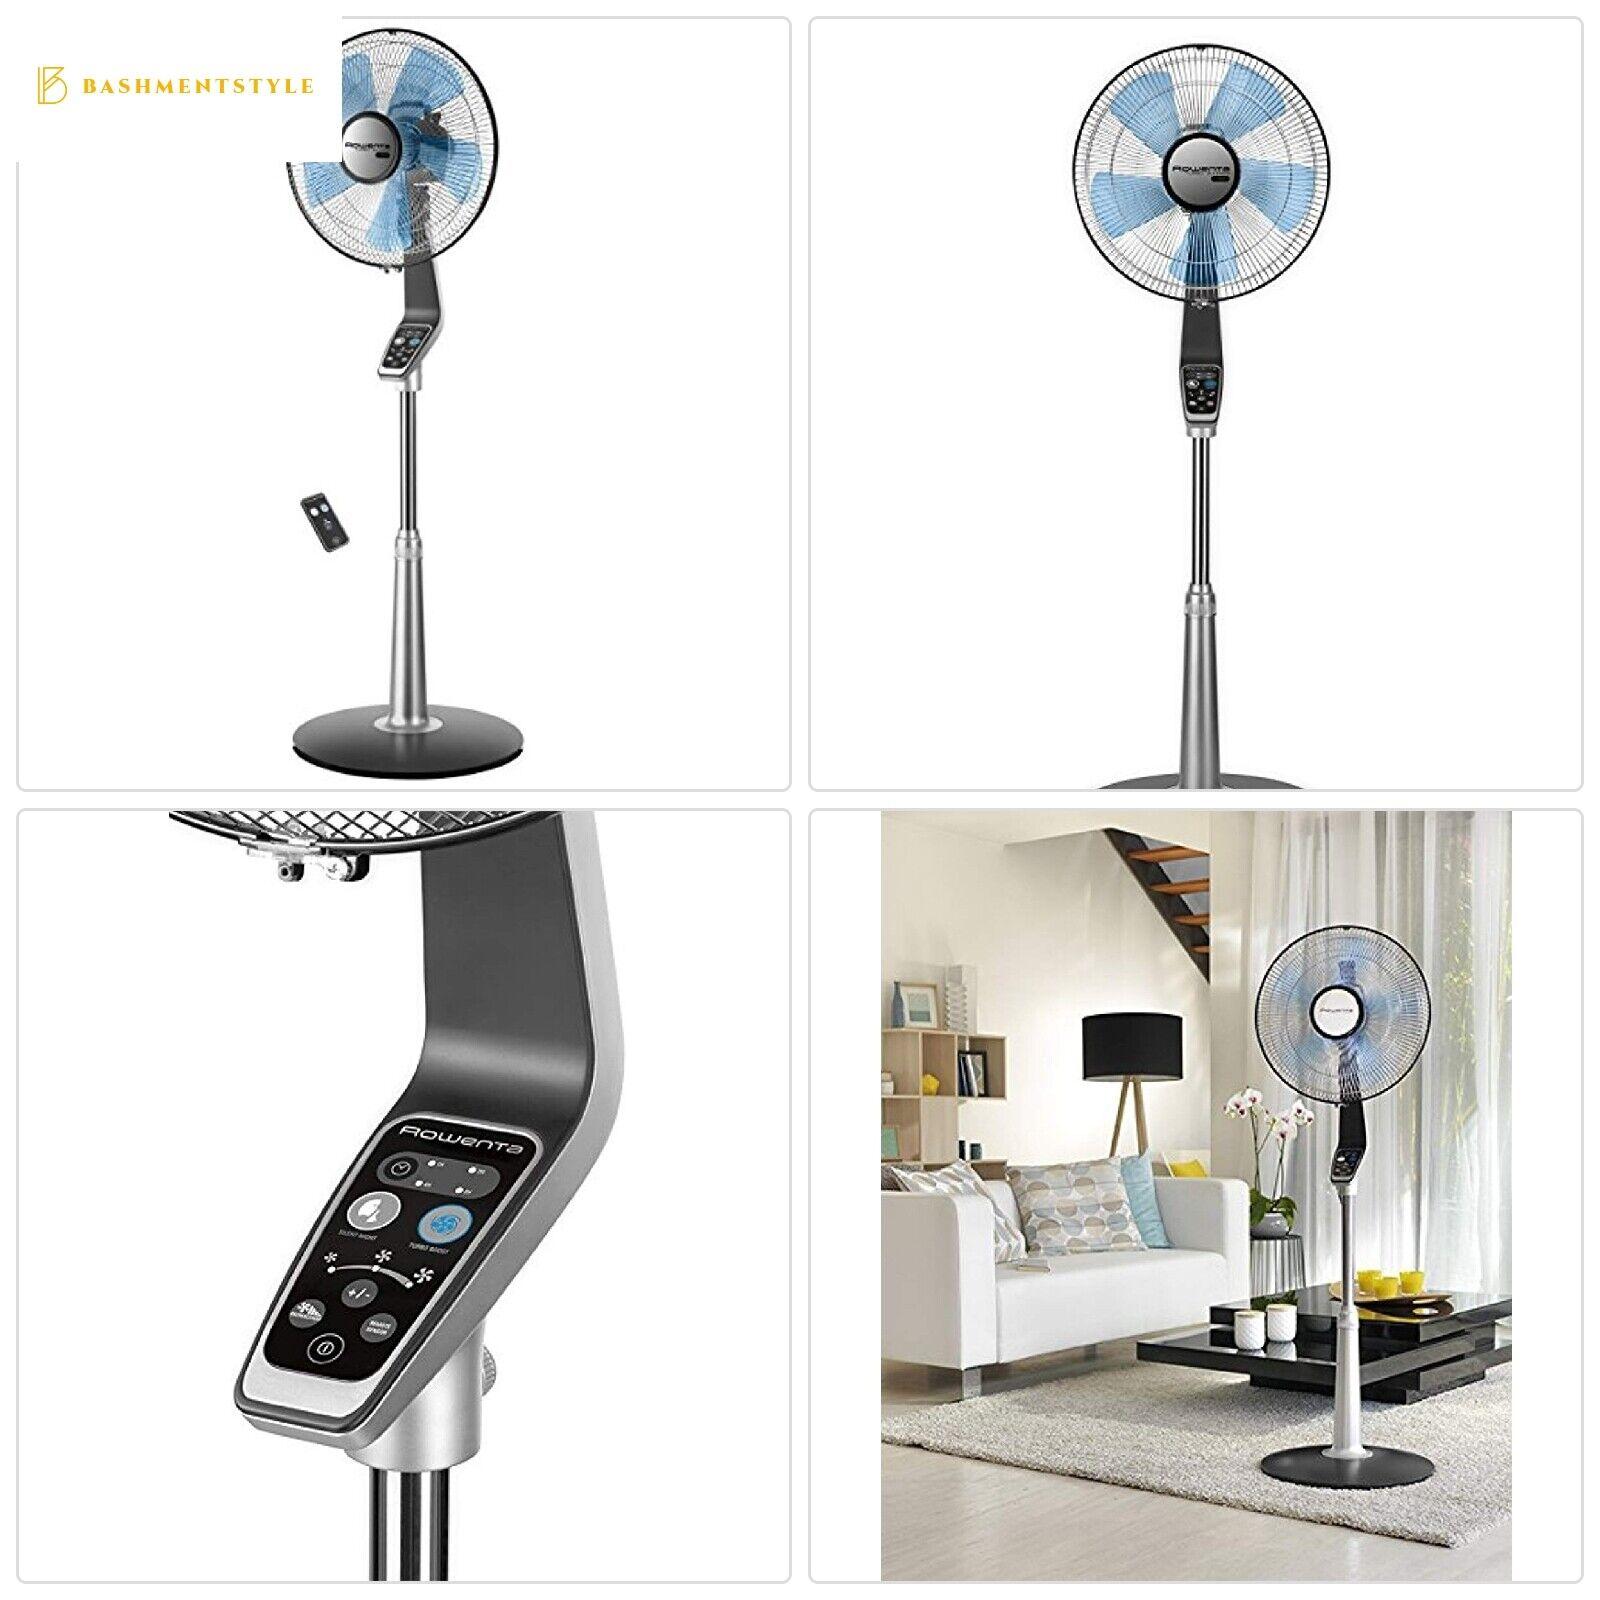 Rowenta VU5670 Turbo silence Stand Fan Oscillating Fan with